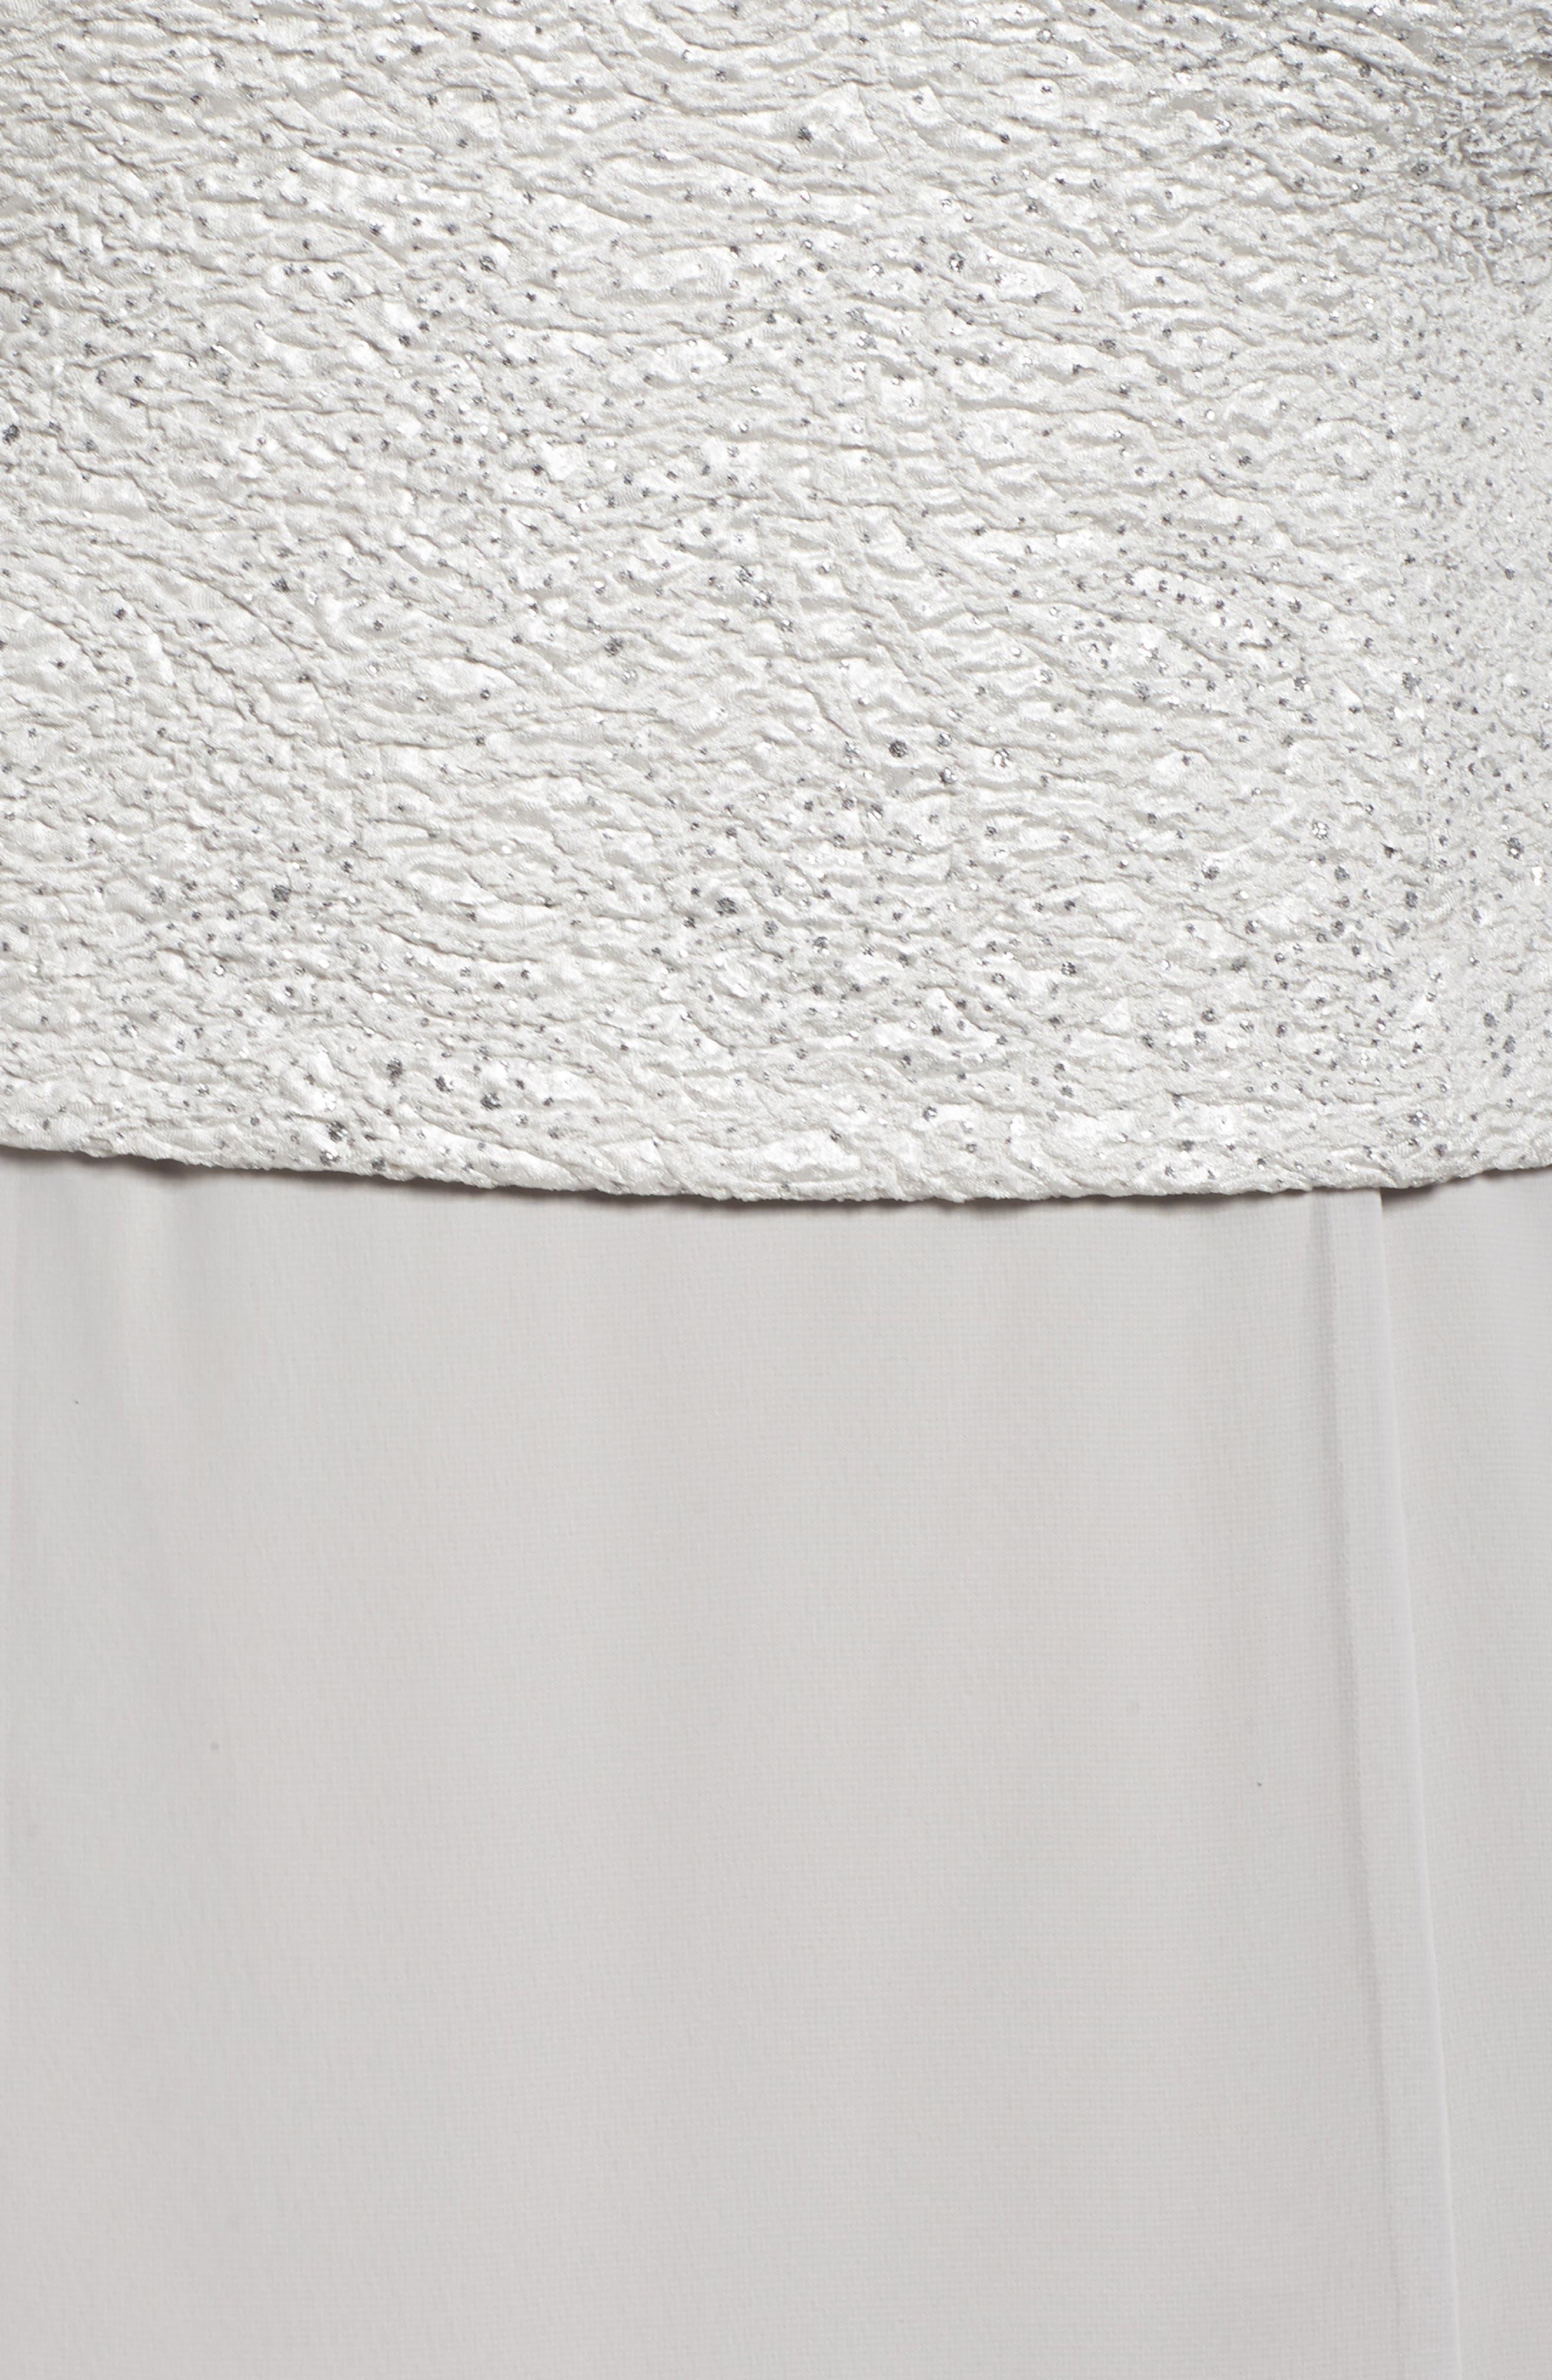 Mock Two-Piece Jacket Dress,                             Alternate thumbnail 3, color,                             Silver